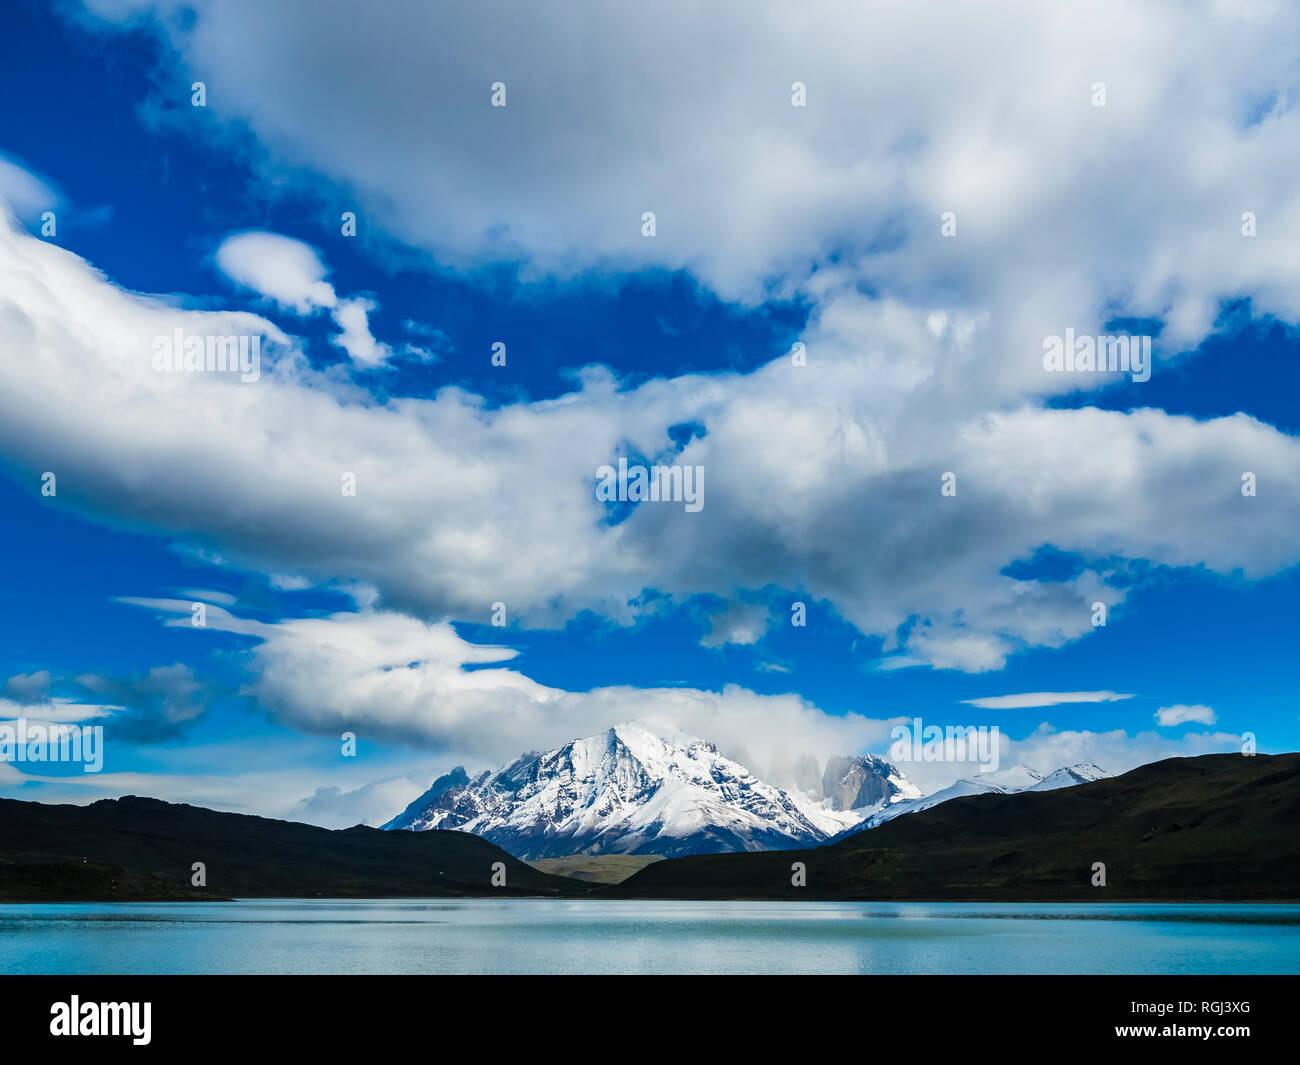 Chile, Patagonia, Magallanes y la Antartica Chilena Region, Torres del Paine National Park, Cuernos del Paine, Laguna Amarga Stock Photo